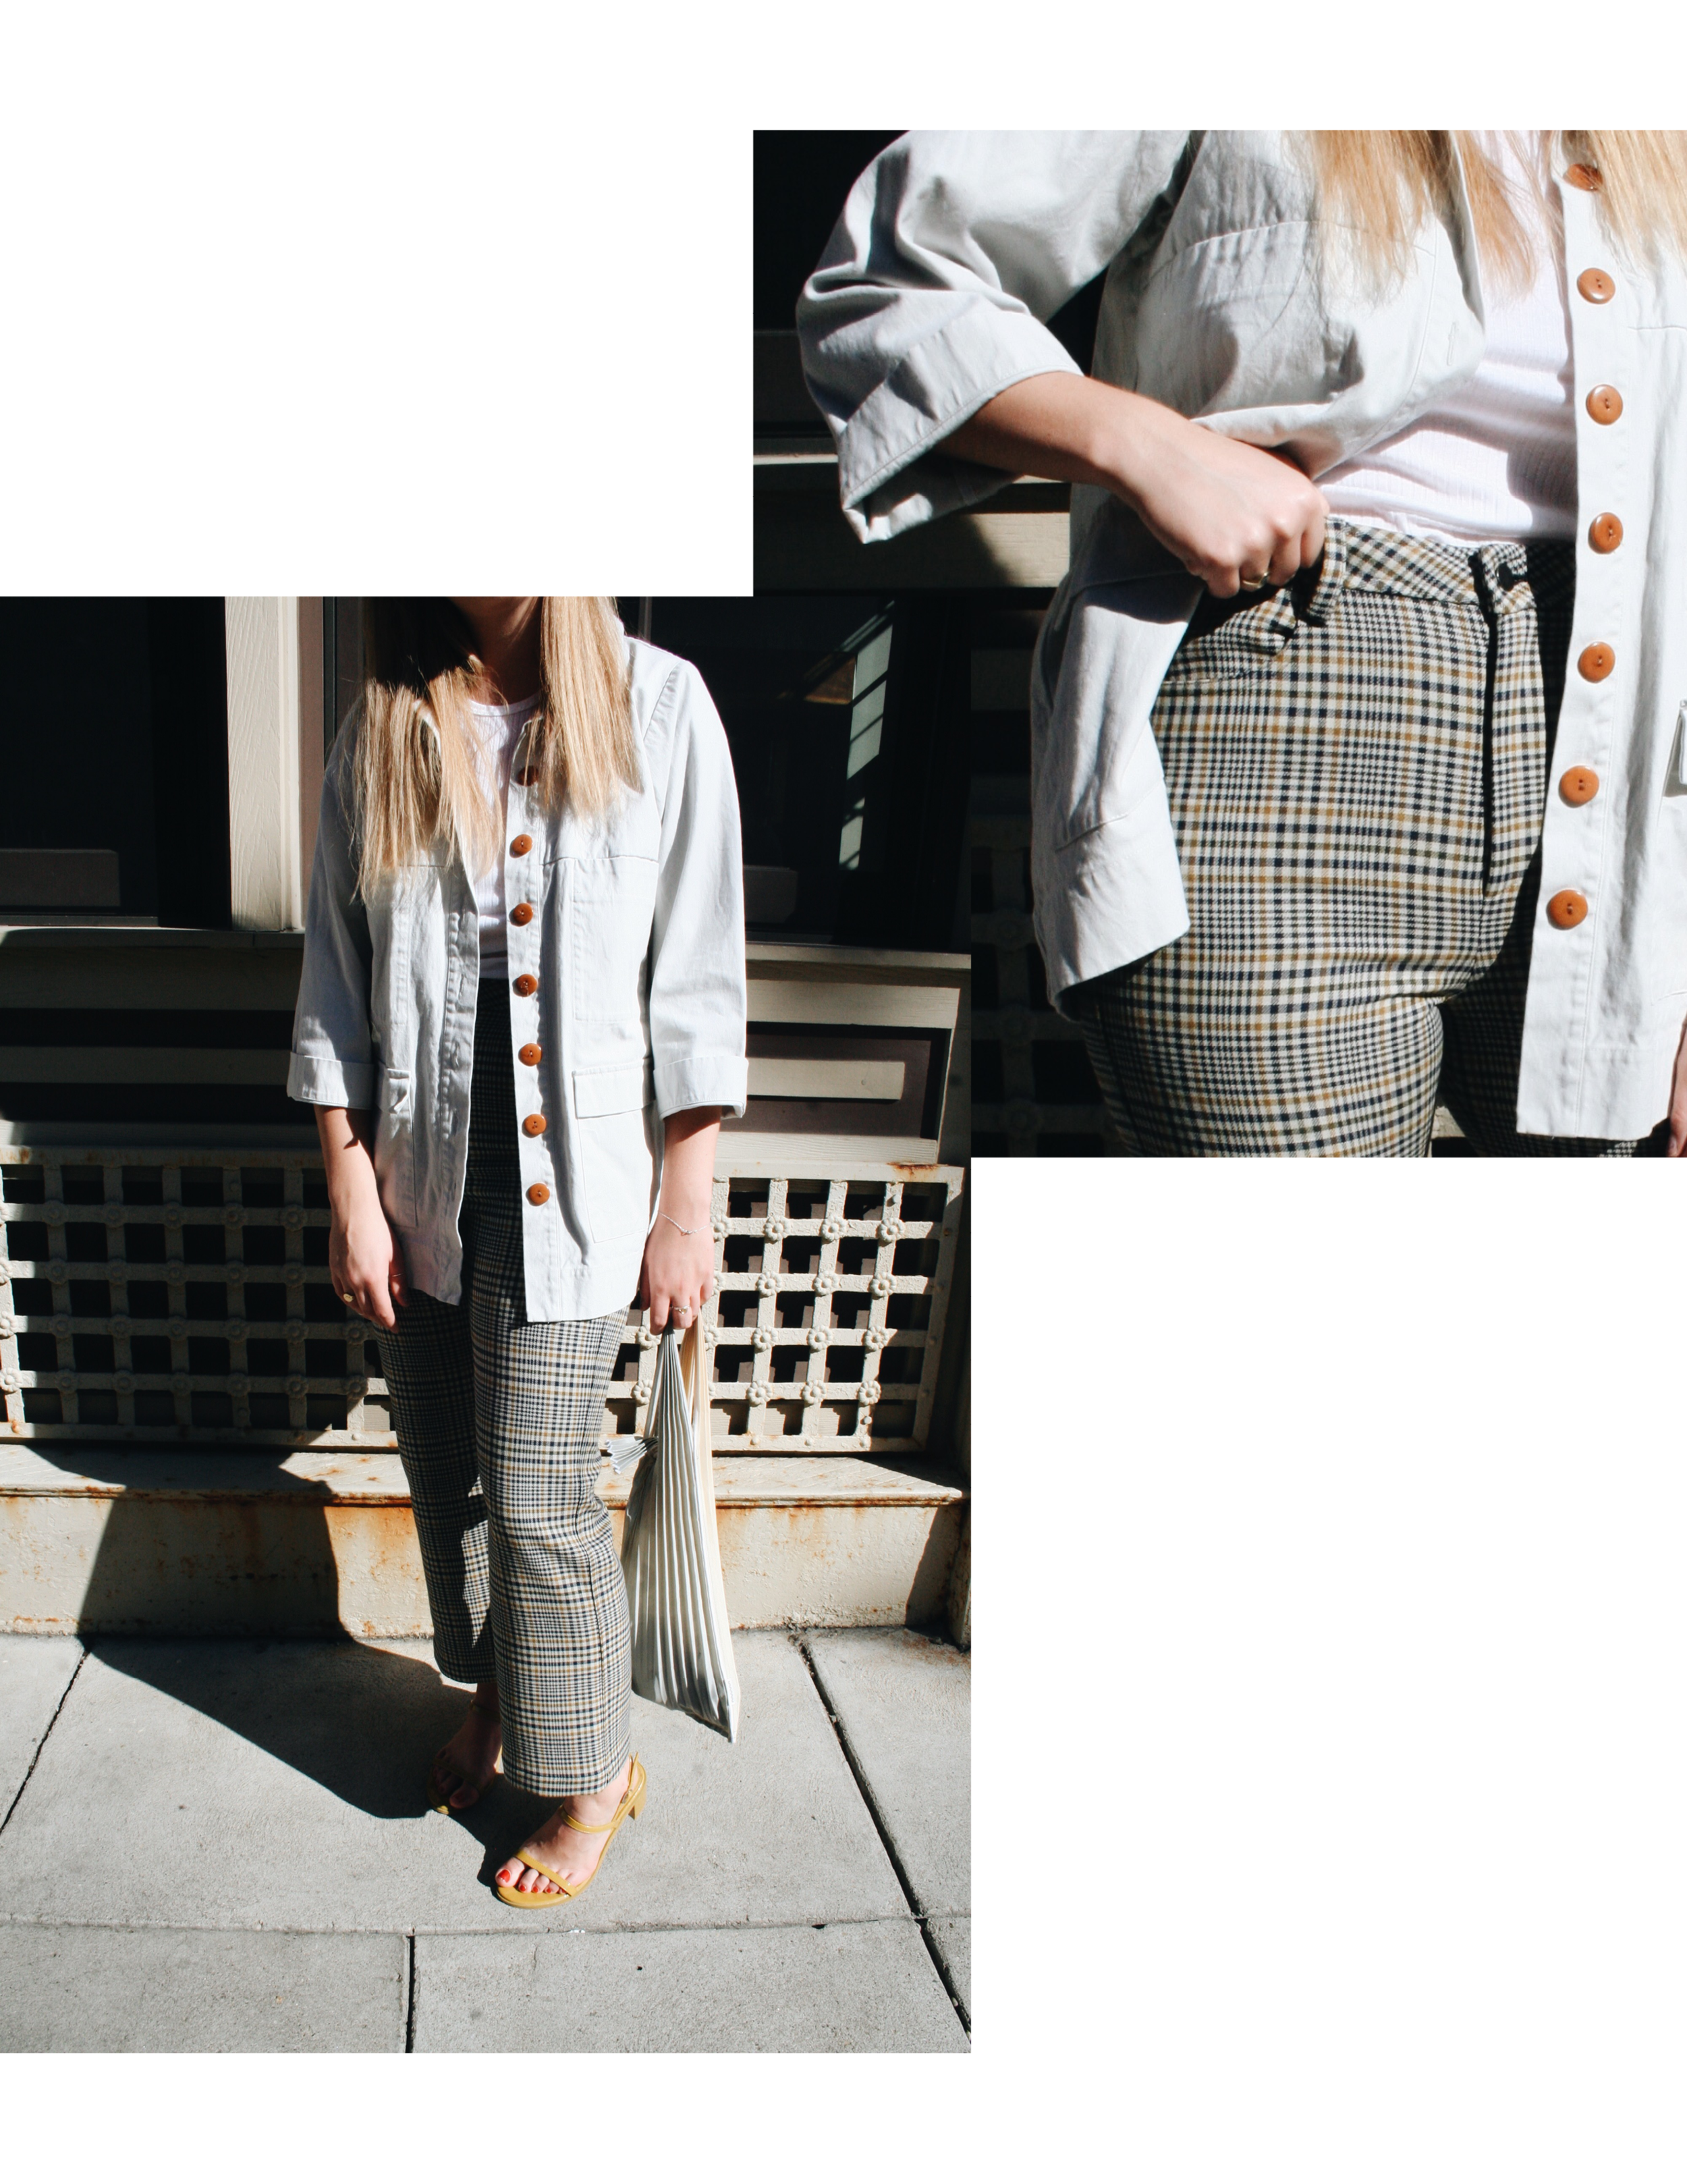 blog post plaid pants page 1 and 2.png